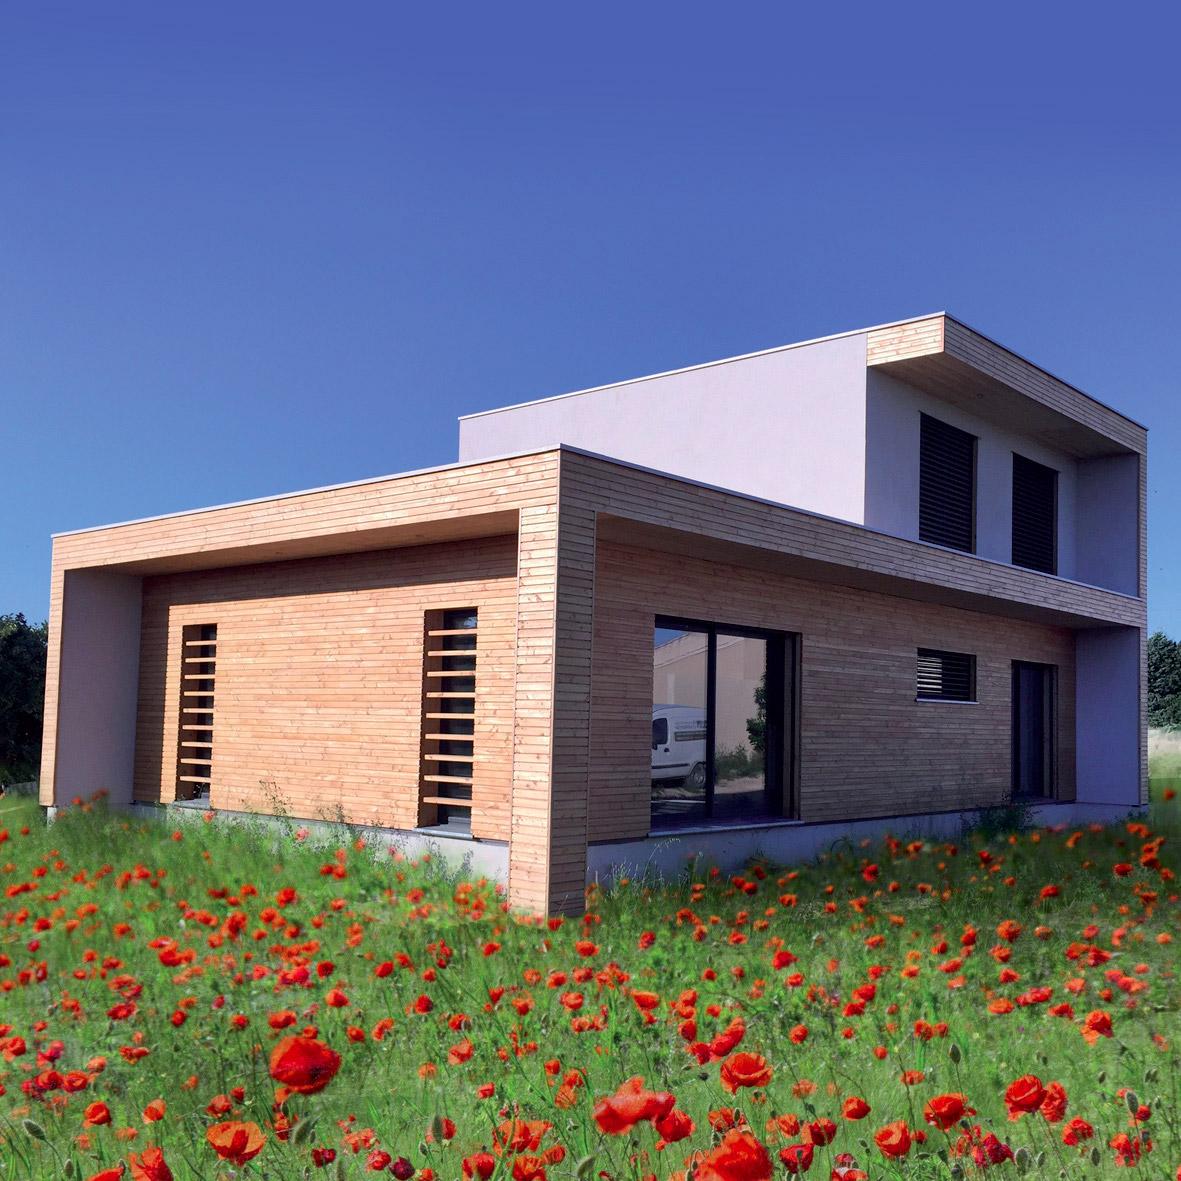 Constructeur maison bois massif gironde for Constructeur maison bois